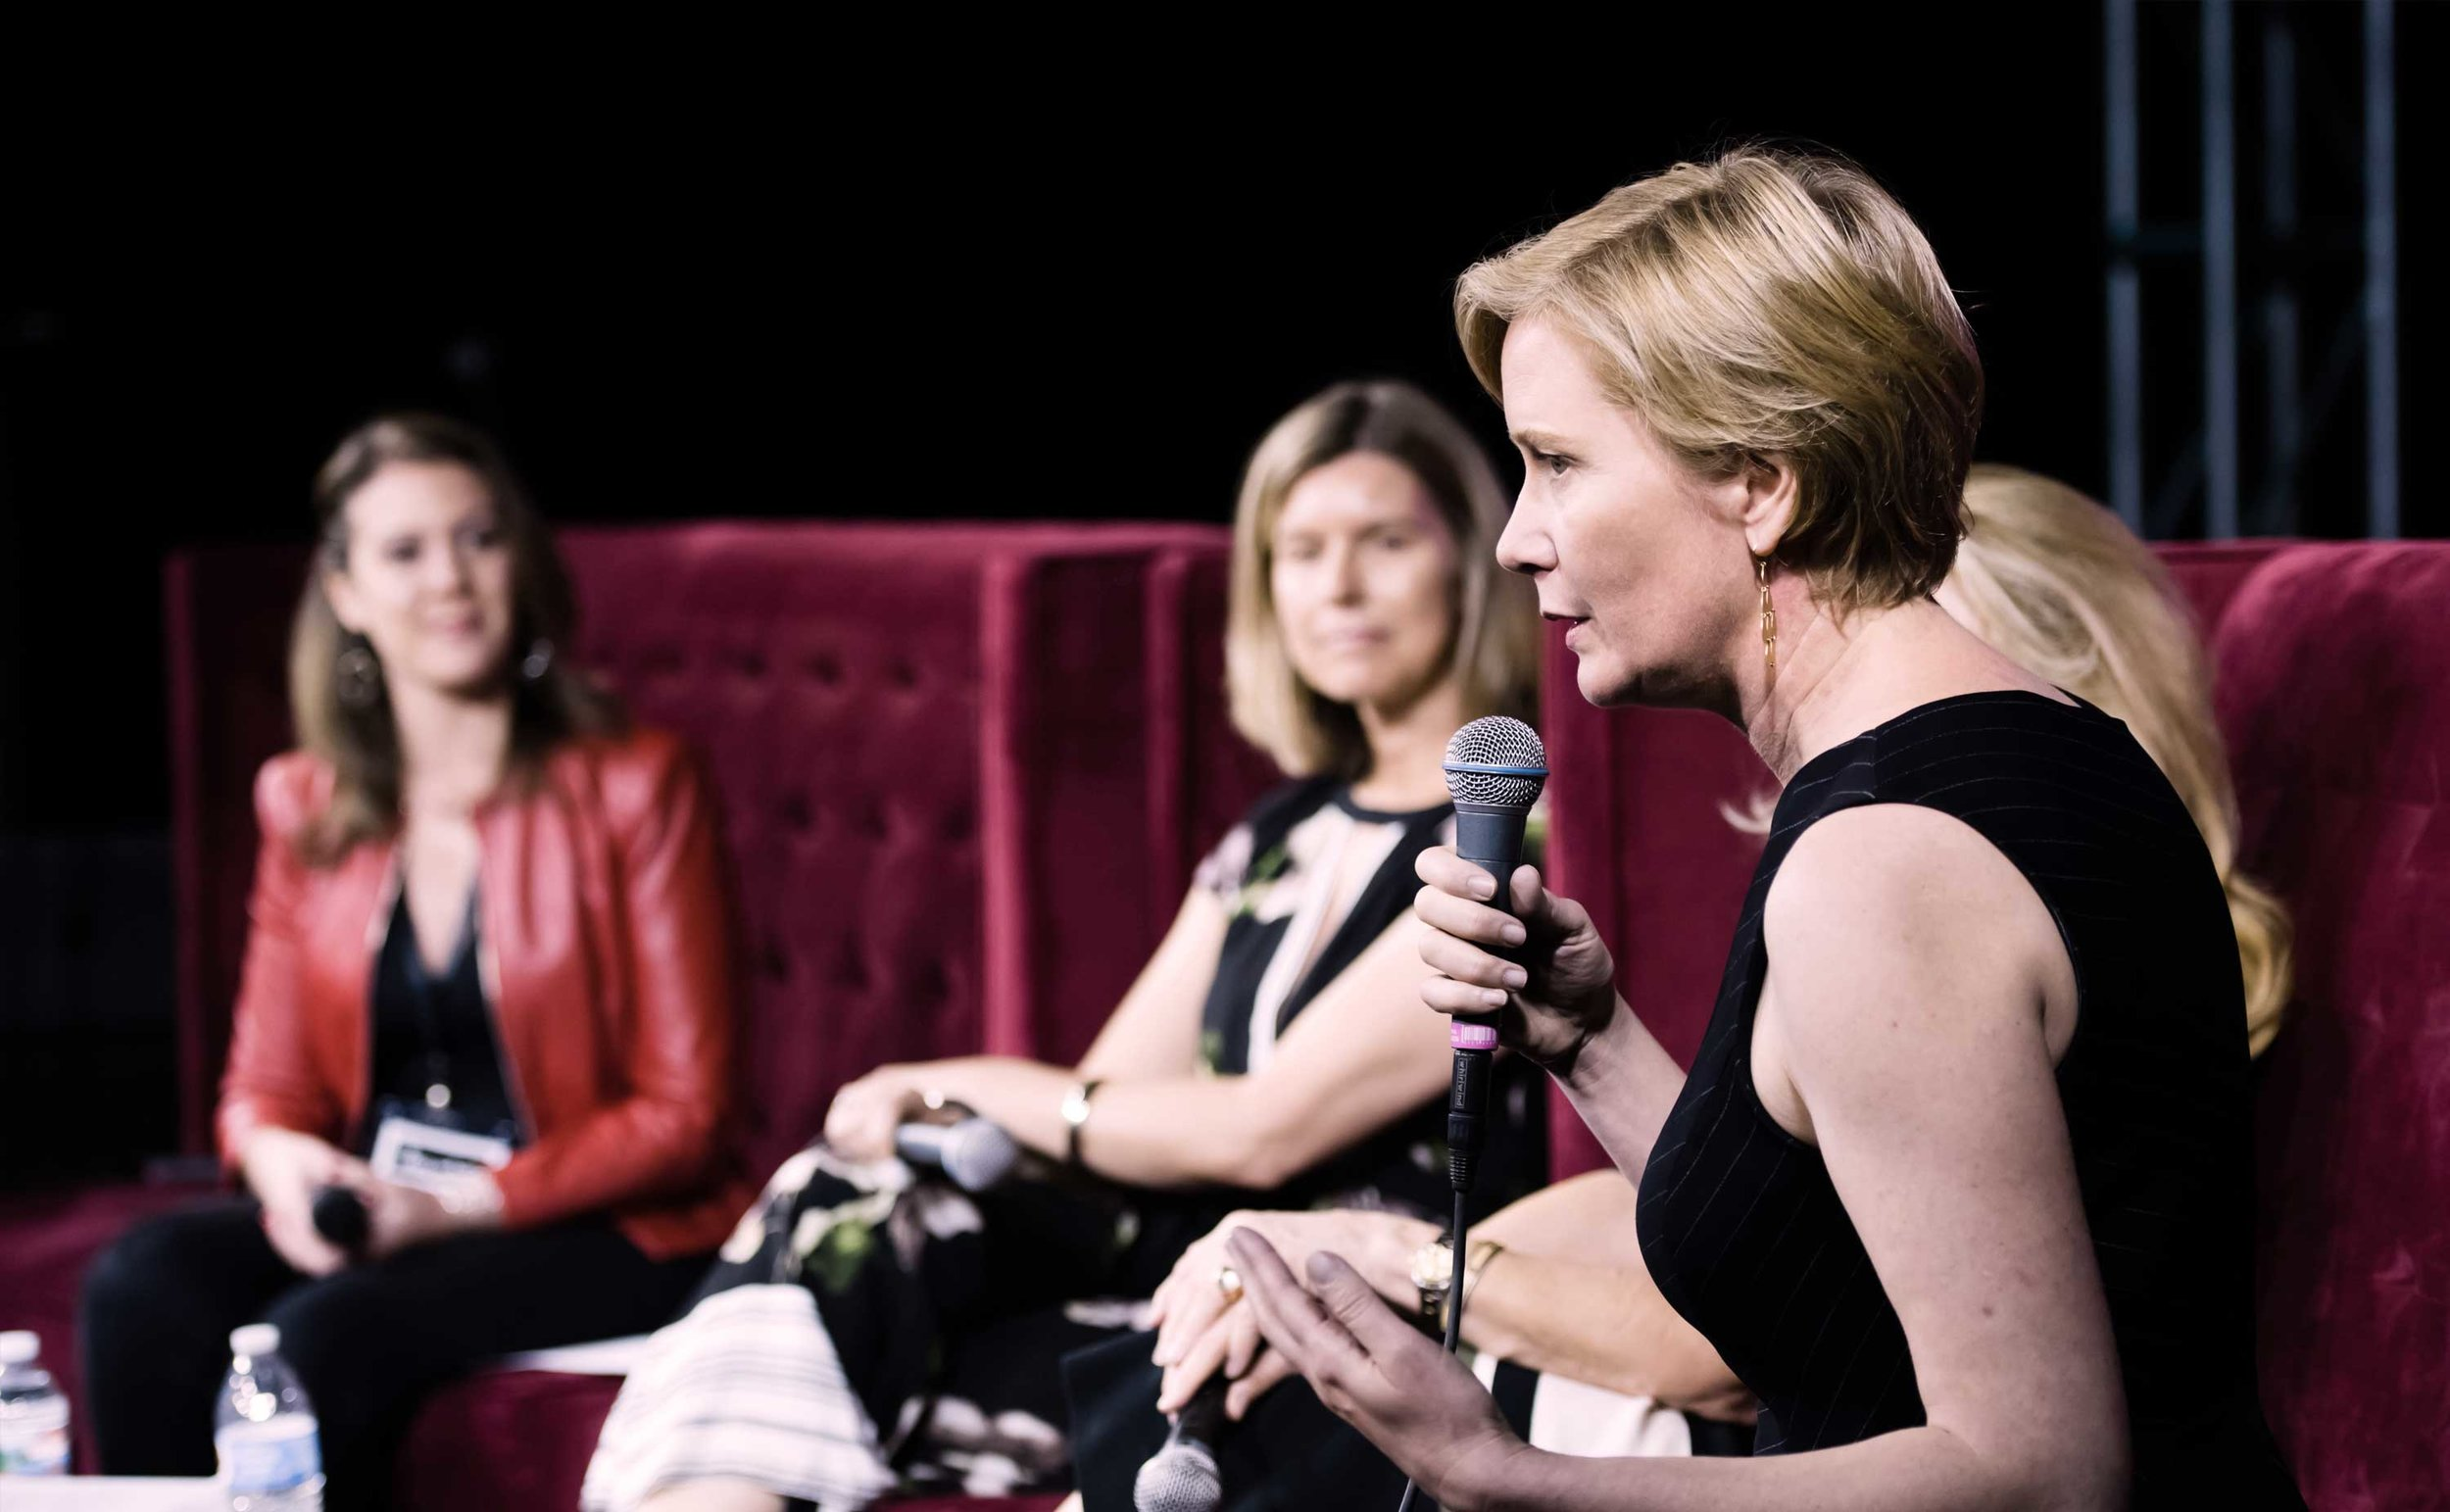 female-founders_photo-victor-bittorf.jpg